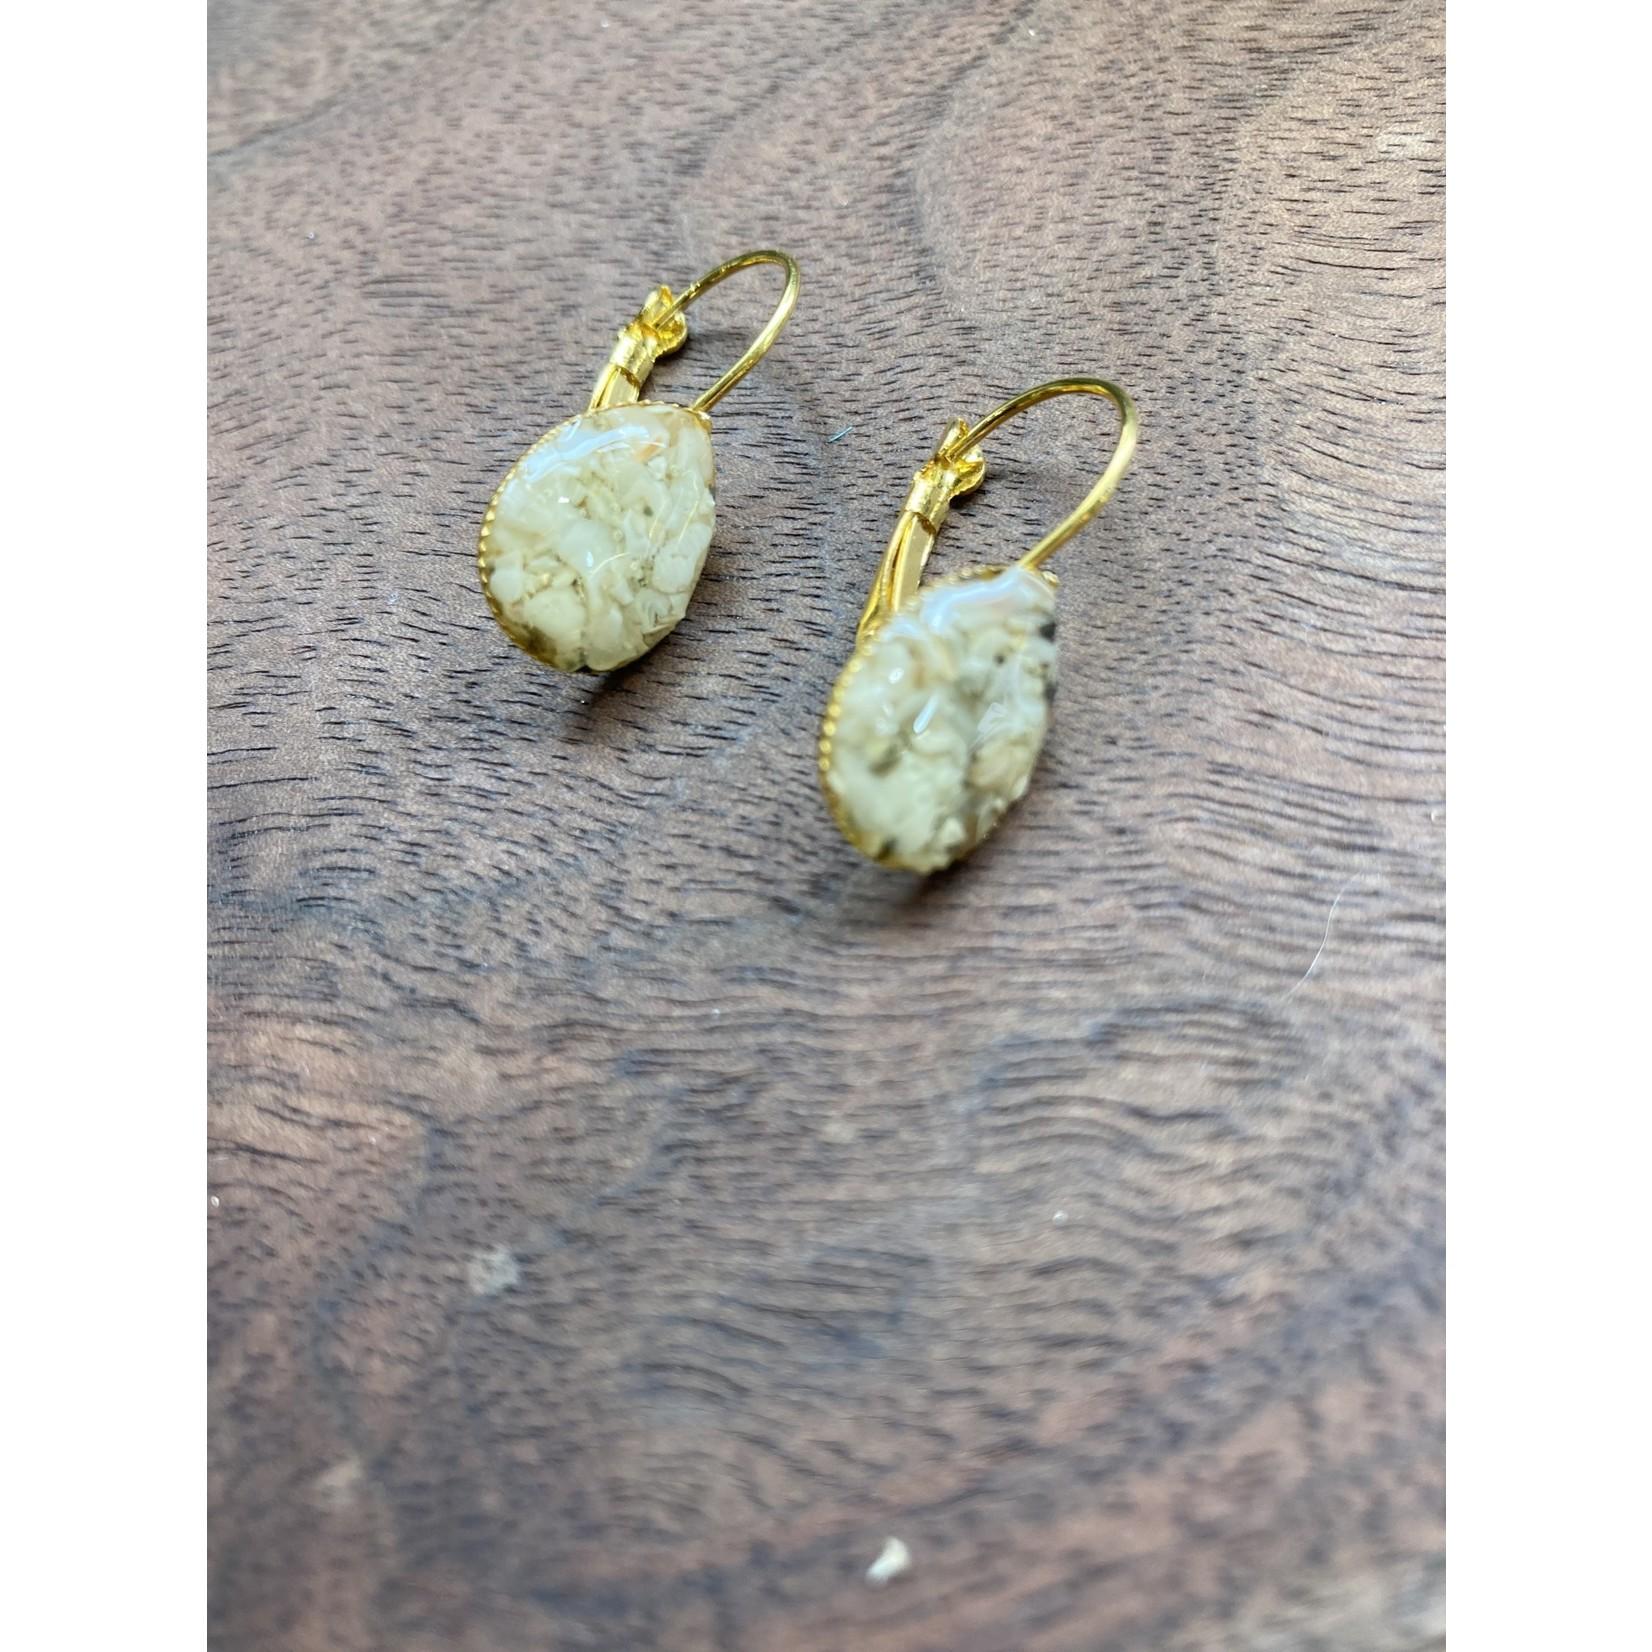 Colleen Hirsh Colleen Hirsh #106 gold tear drop sanibel earrings